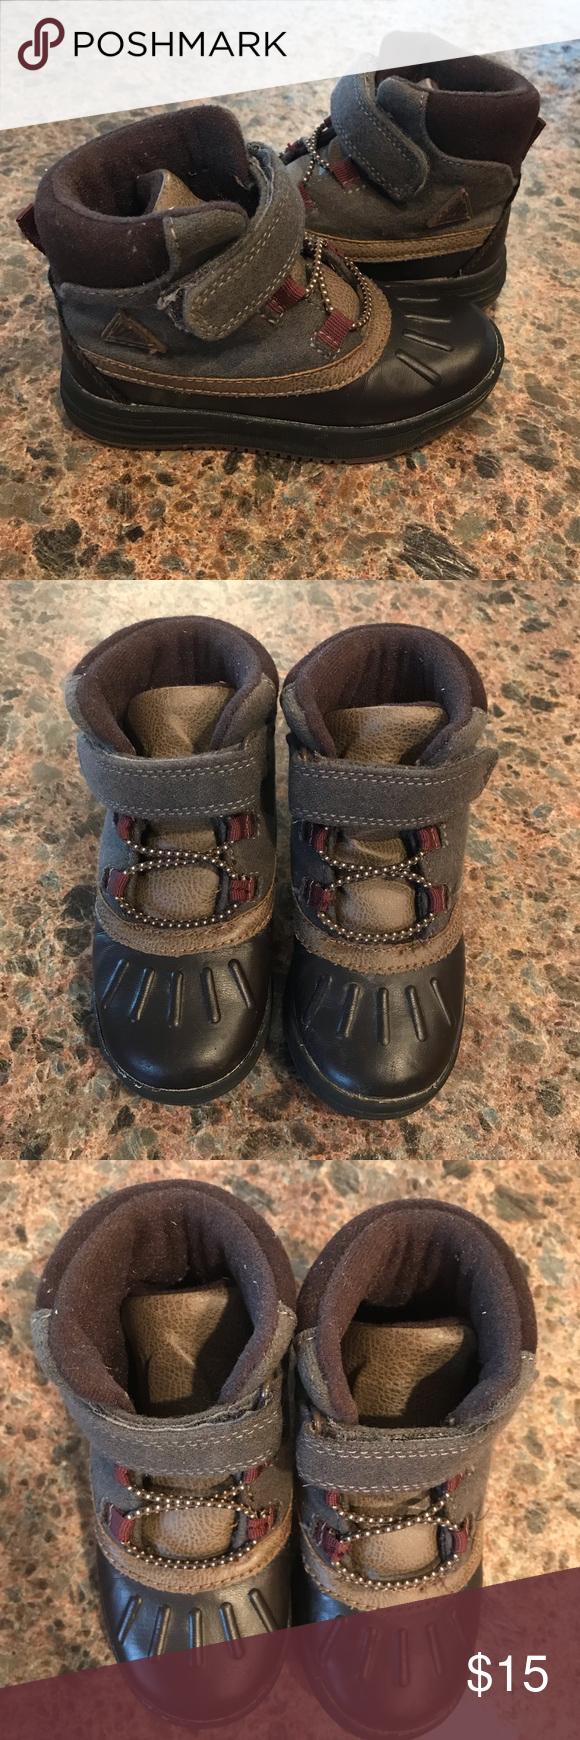 4f00d37cd Carter s Toddler Boy Size 7 Snow Boots